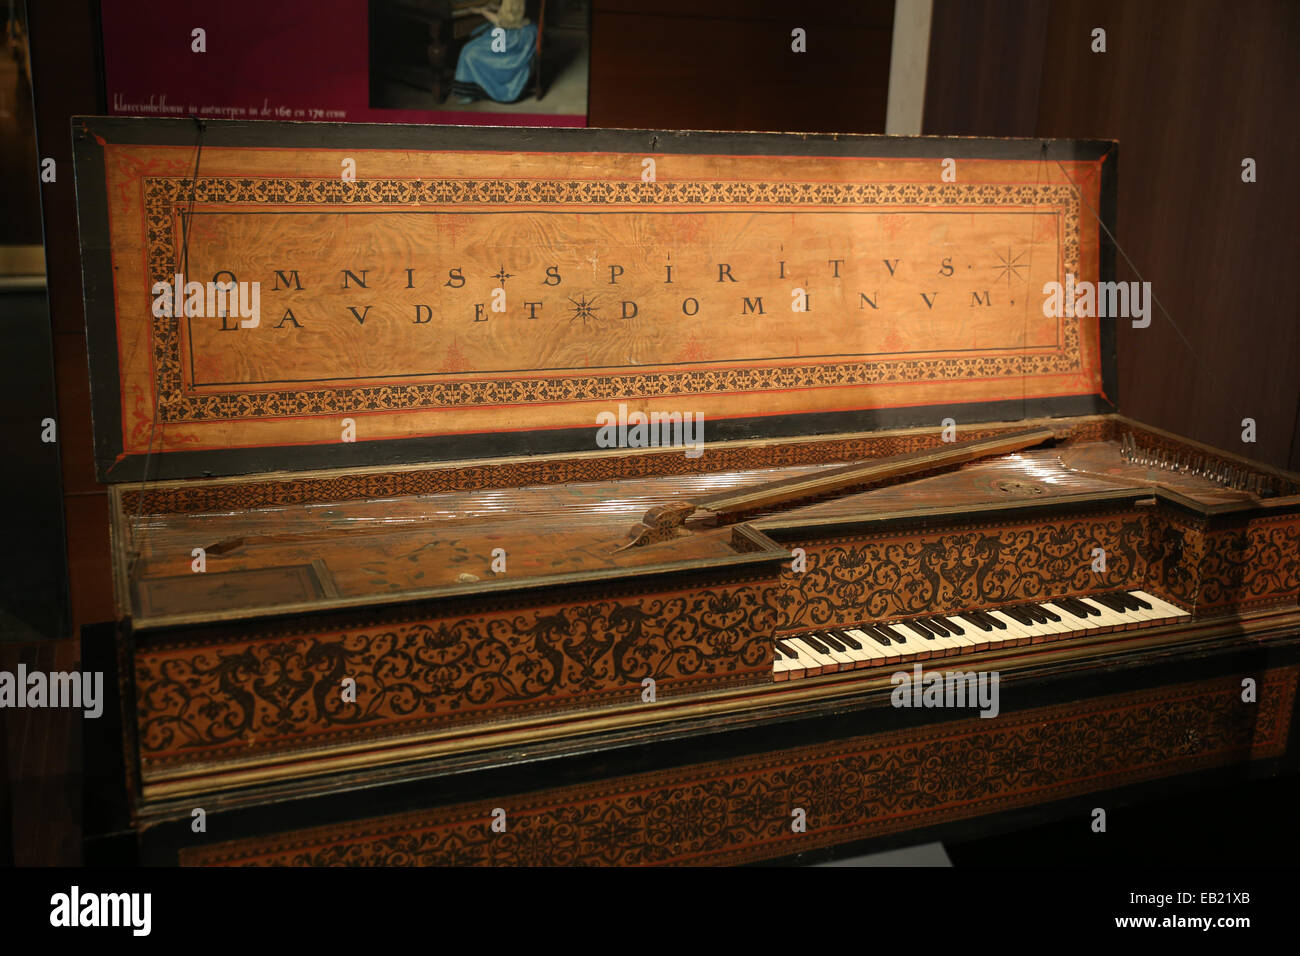 muselaar rectangular virginal piano - Stock Image